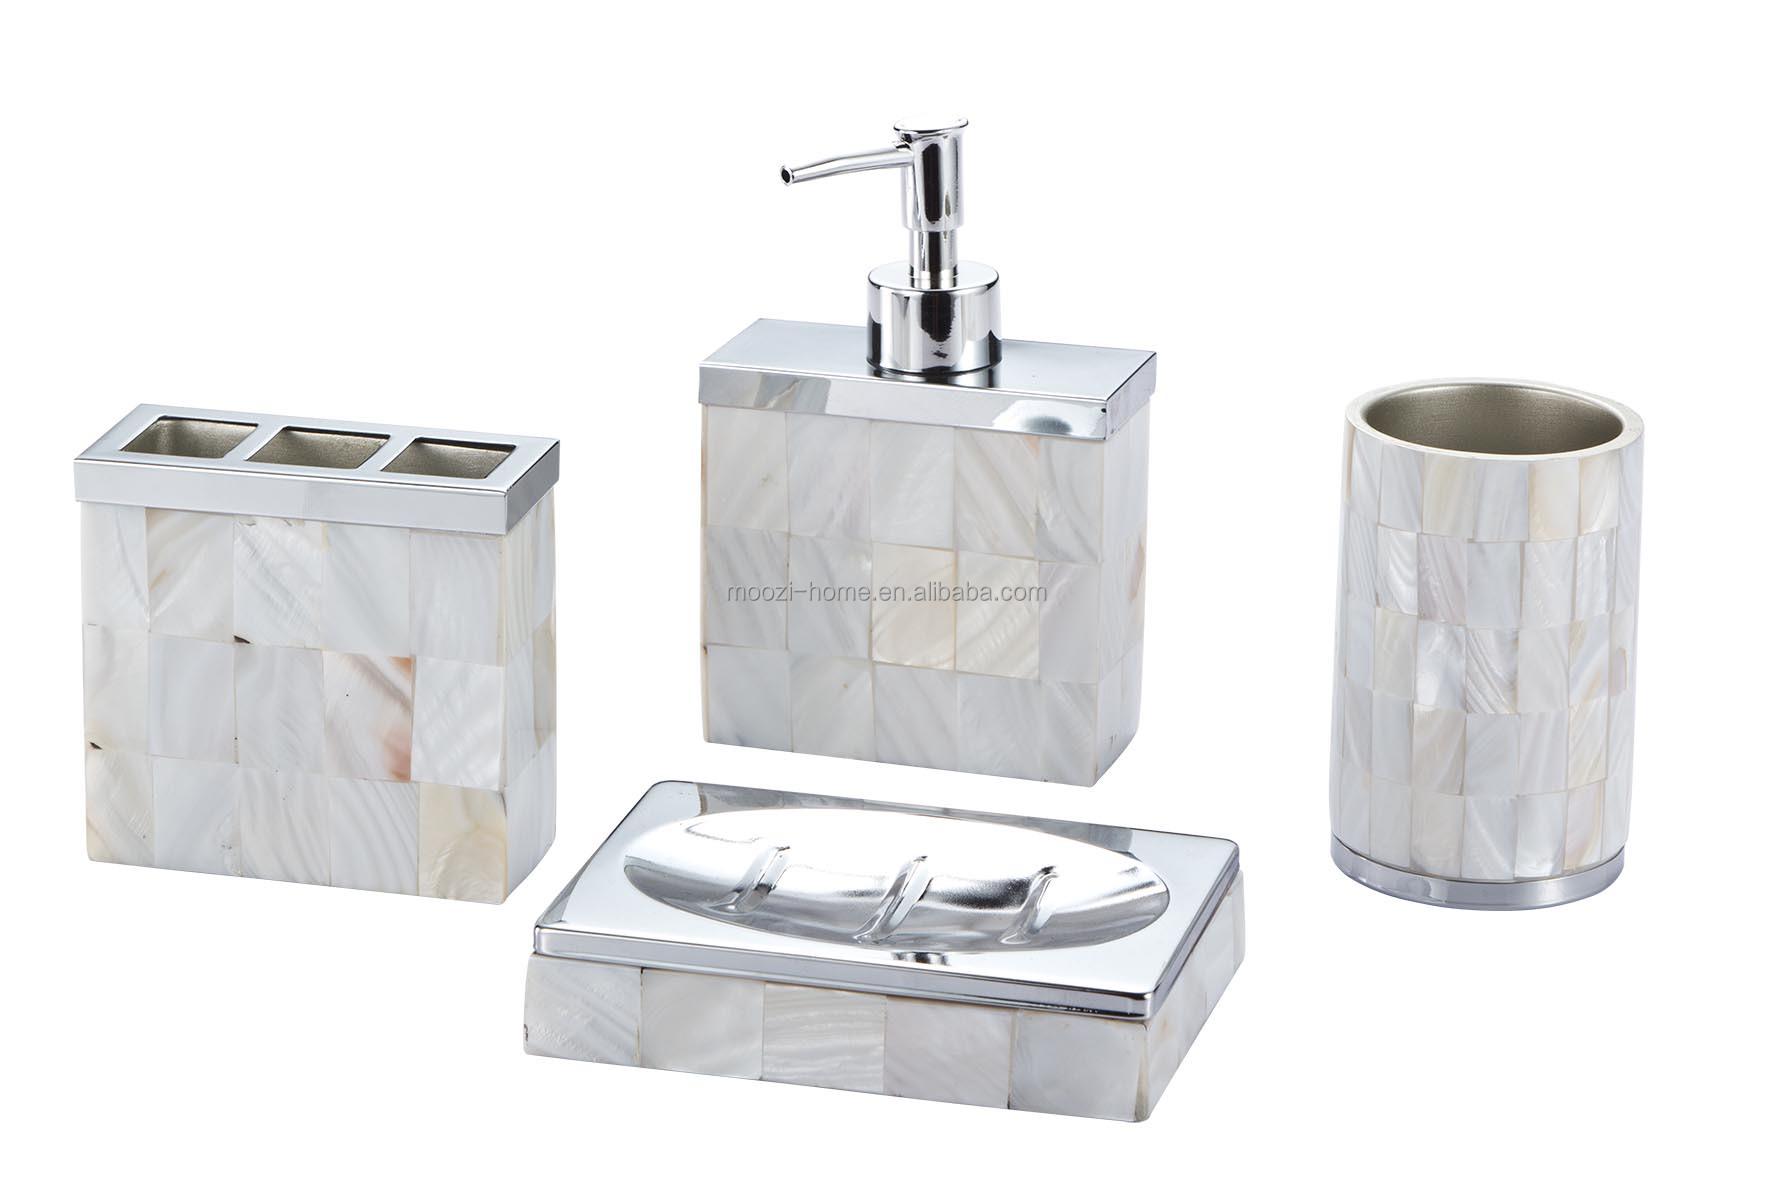 bathroom soap dispensers sets | My Web Value